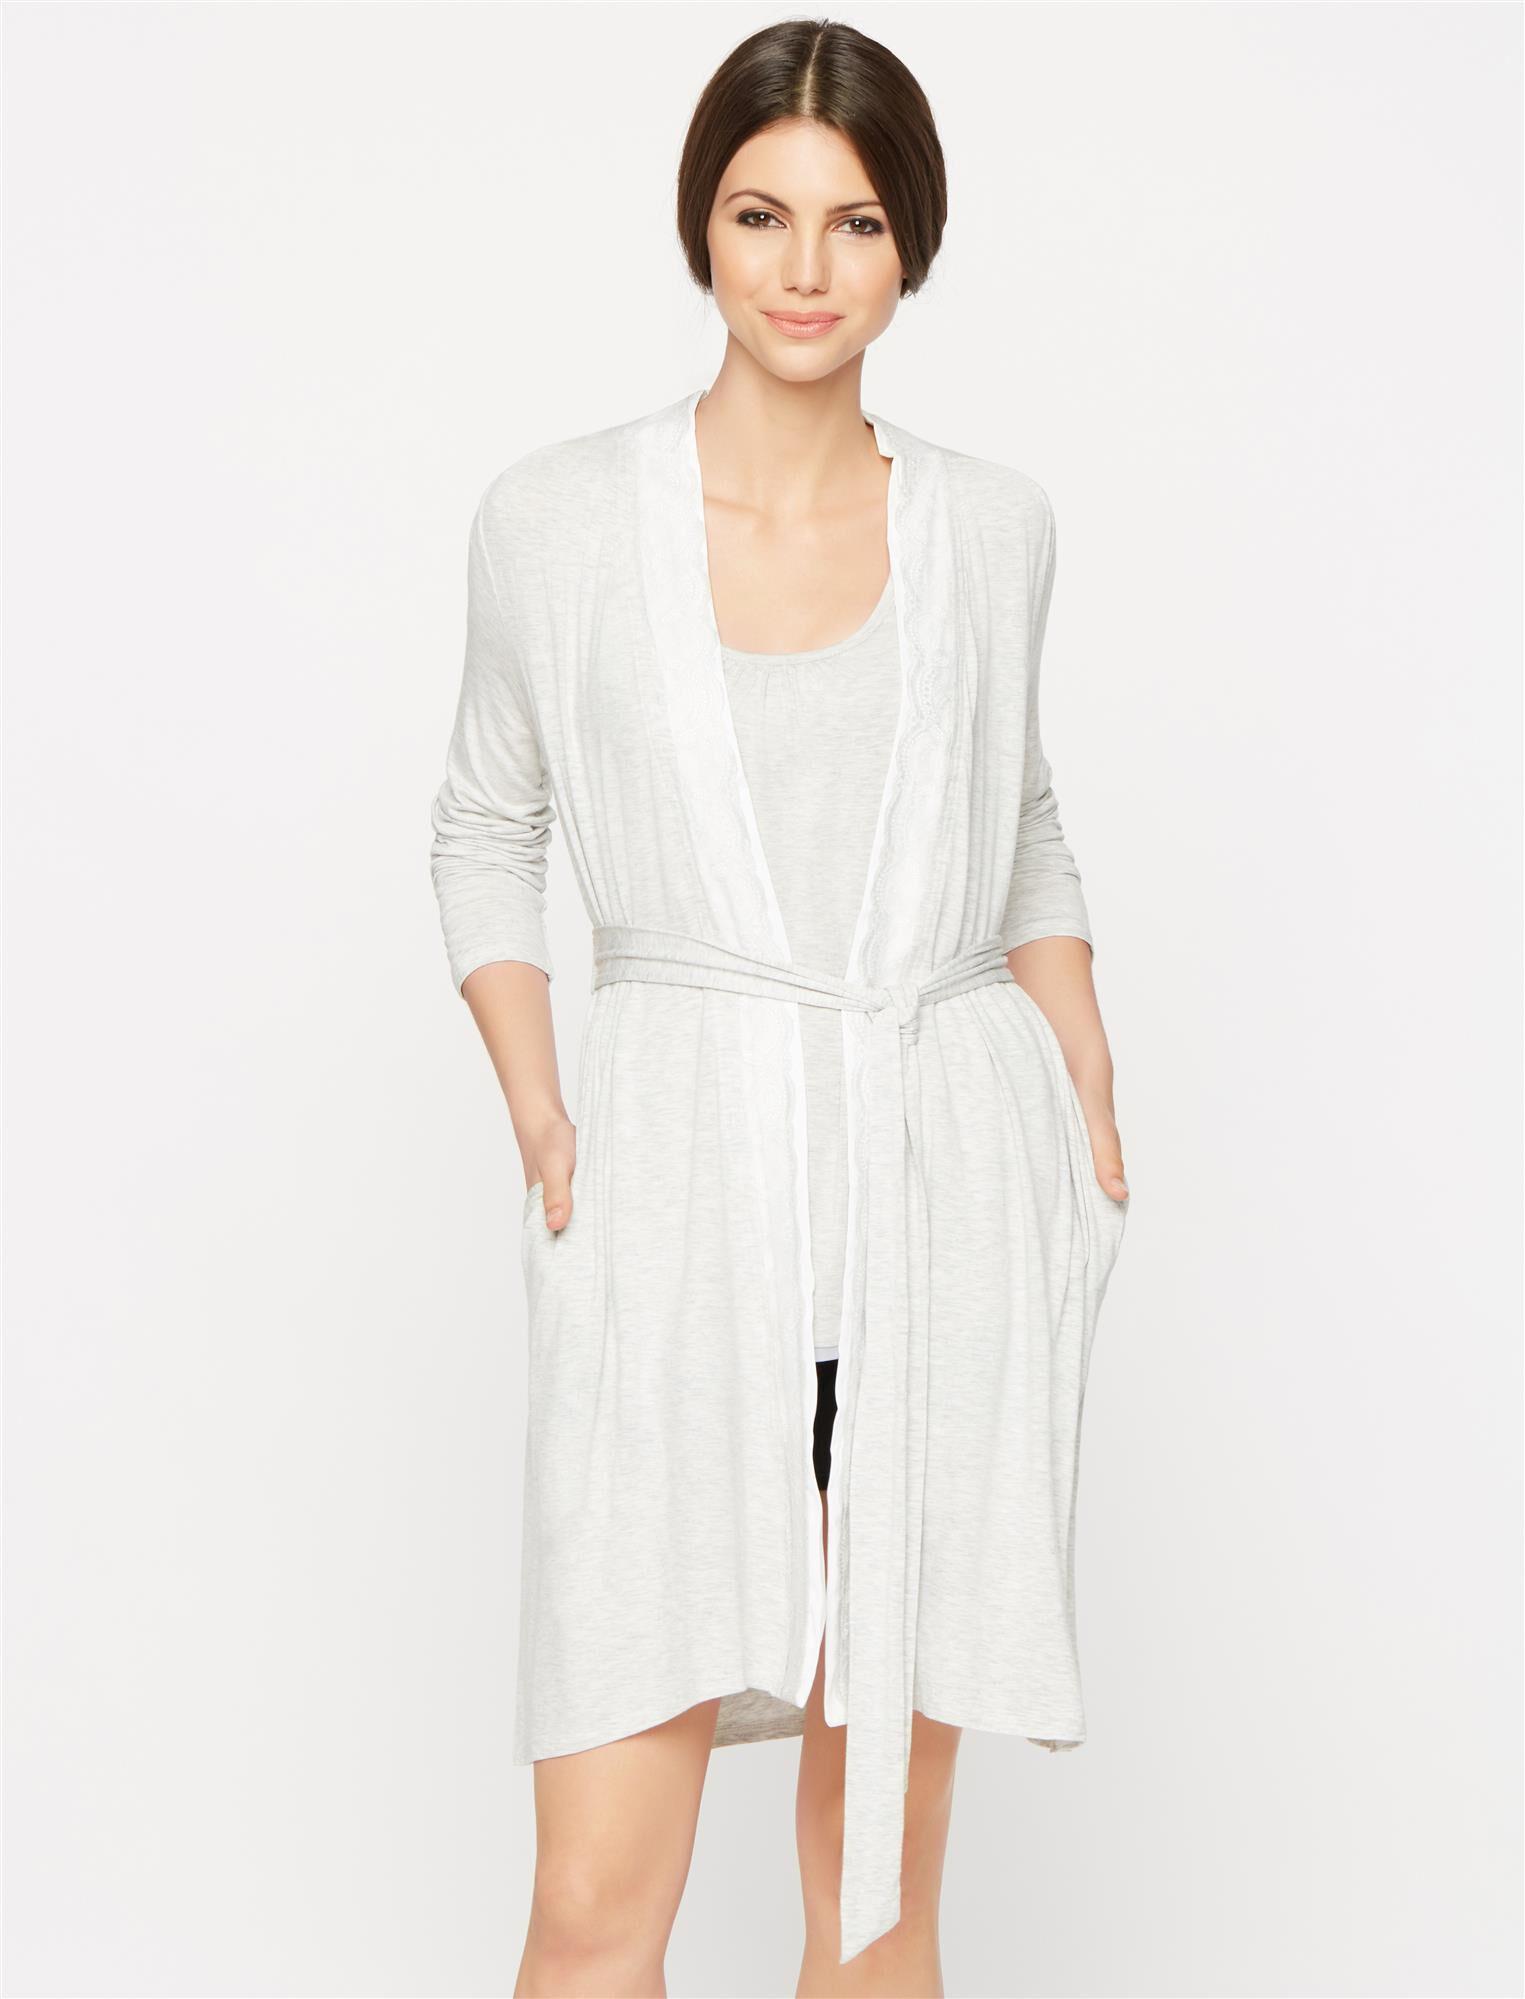 Lace Trim Nursing Robe- Solid